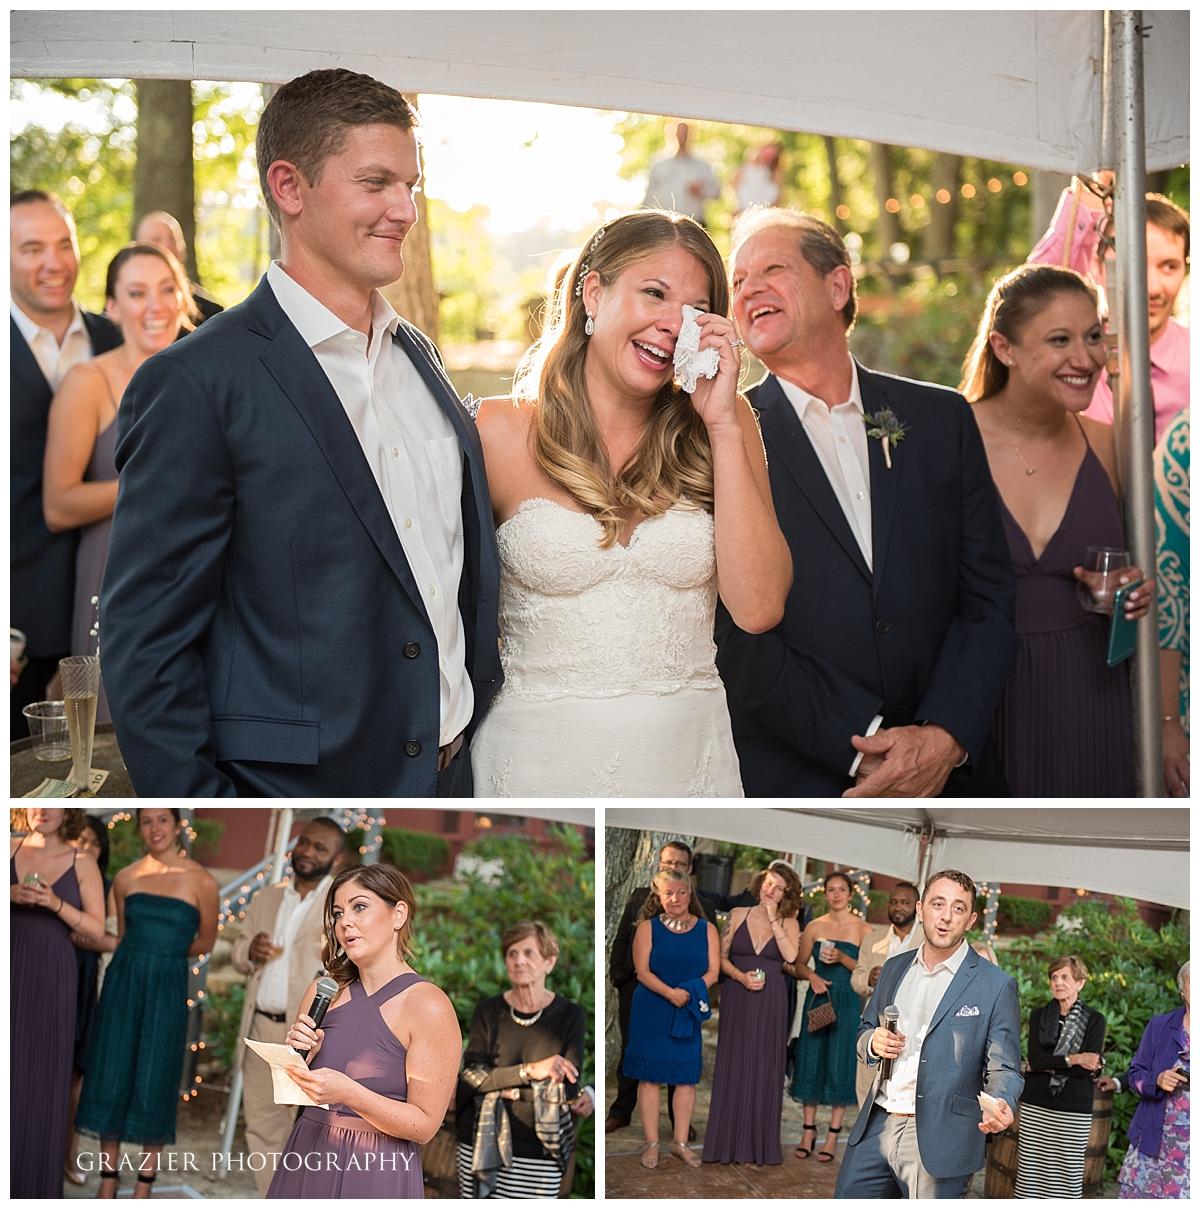 New Hampshire Lake Wedding Grazier Photography 170909-190_WEB.jpg